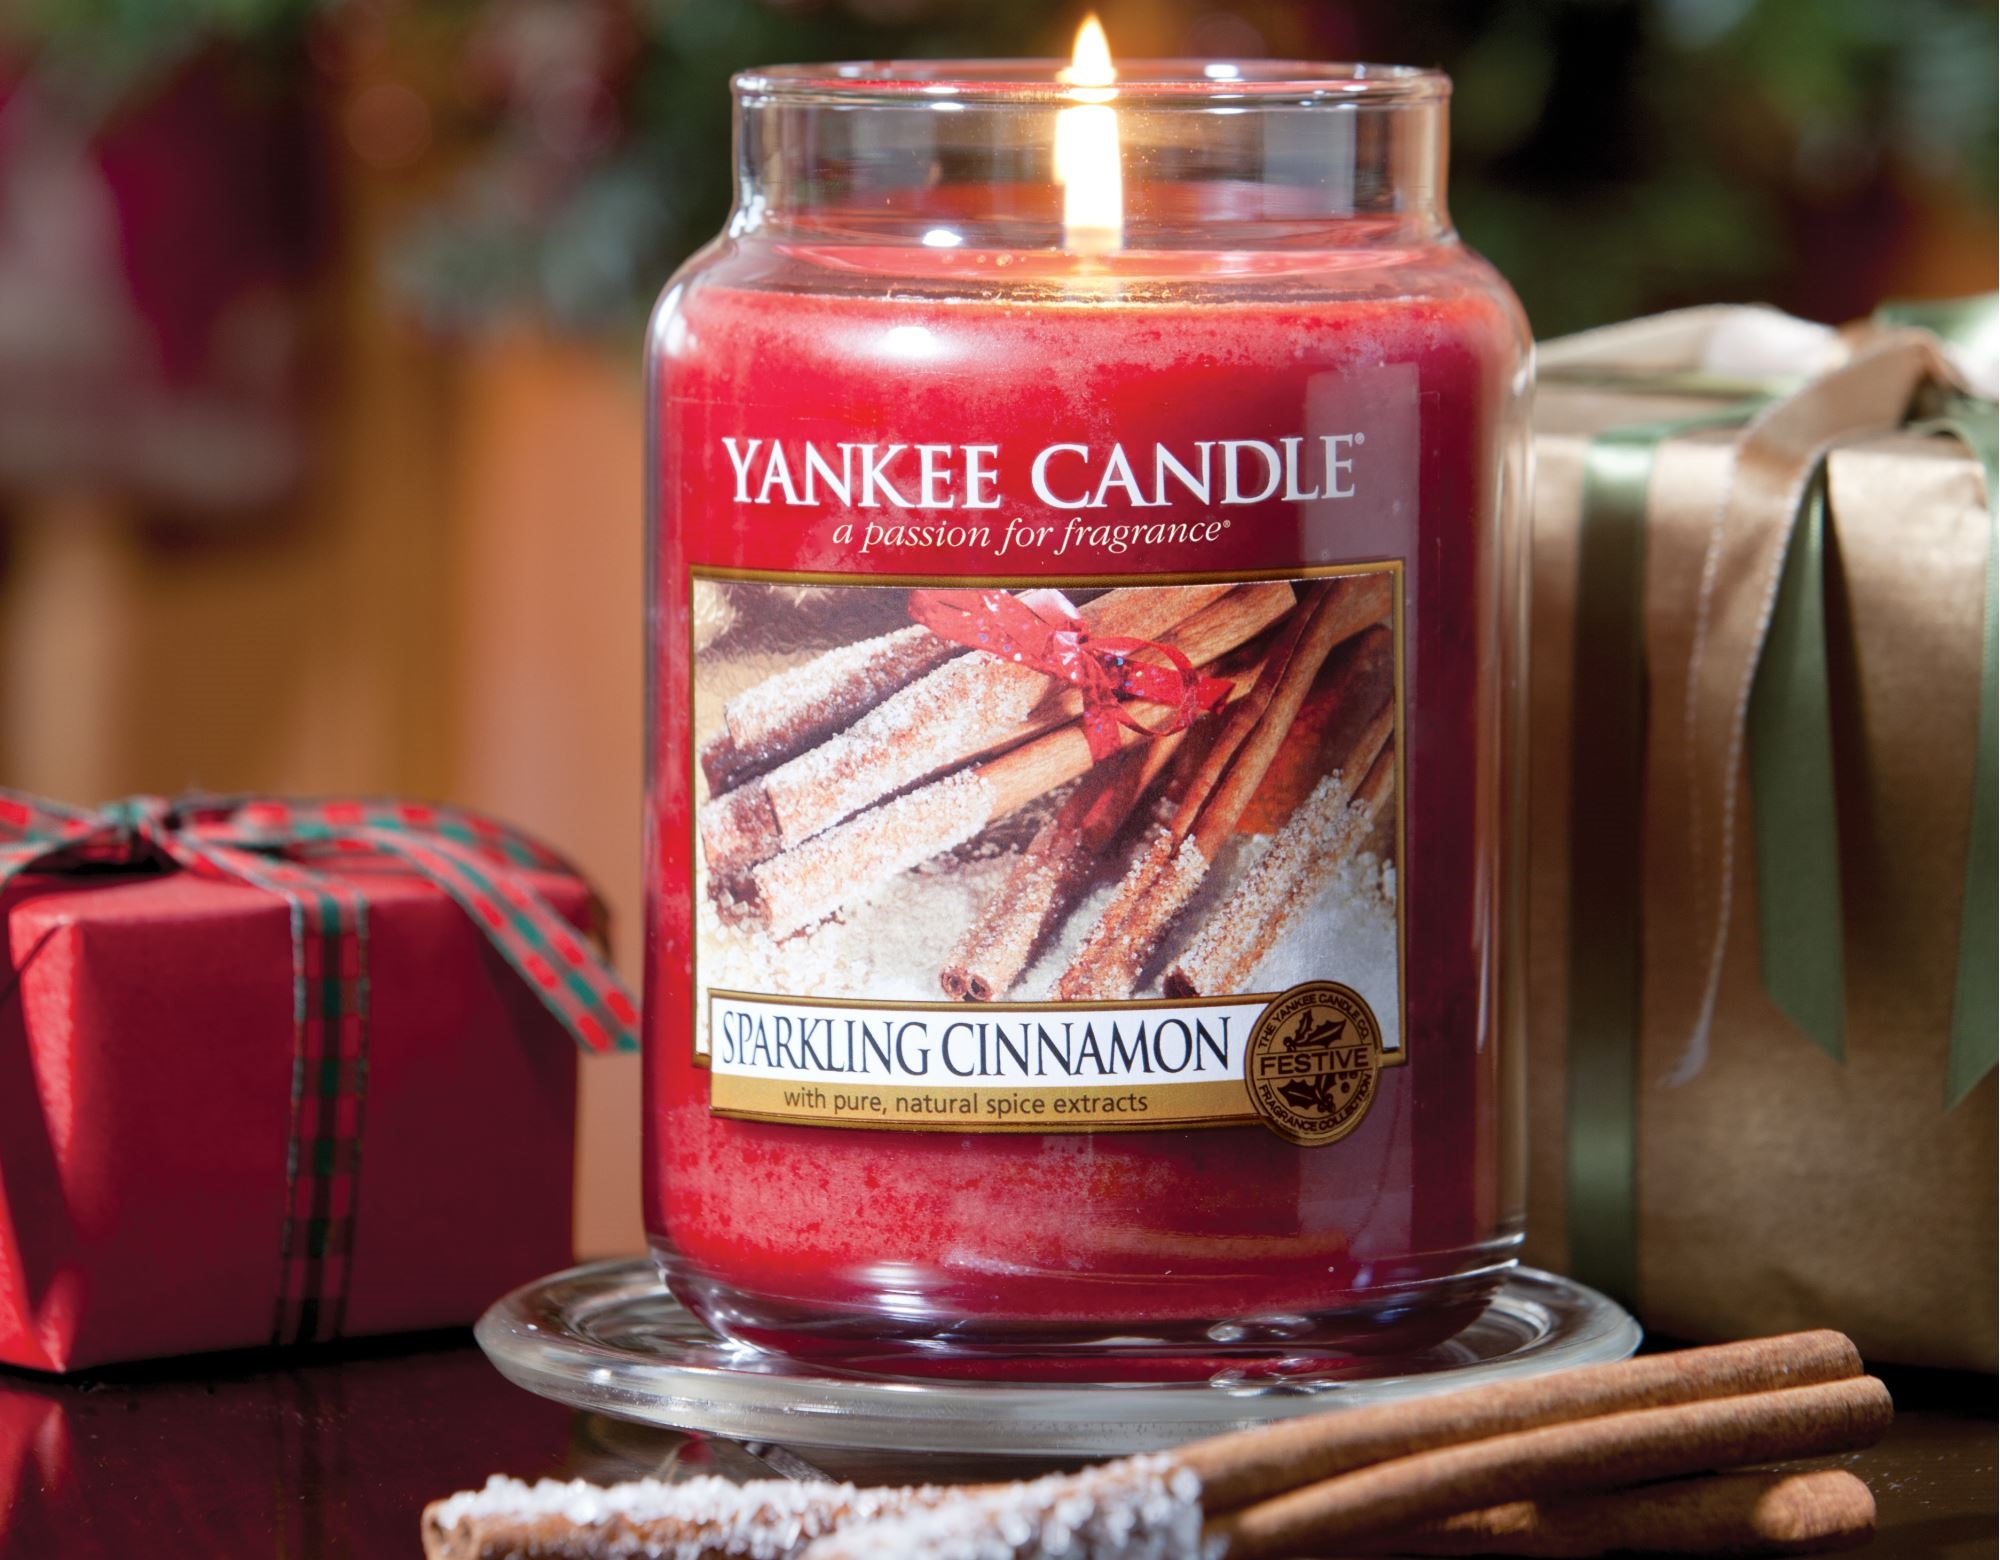 Sparkling Cinnamon Yankee candle